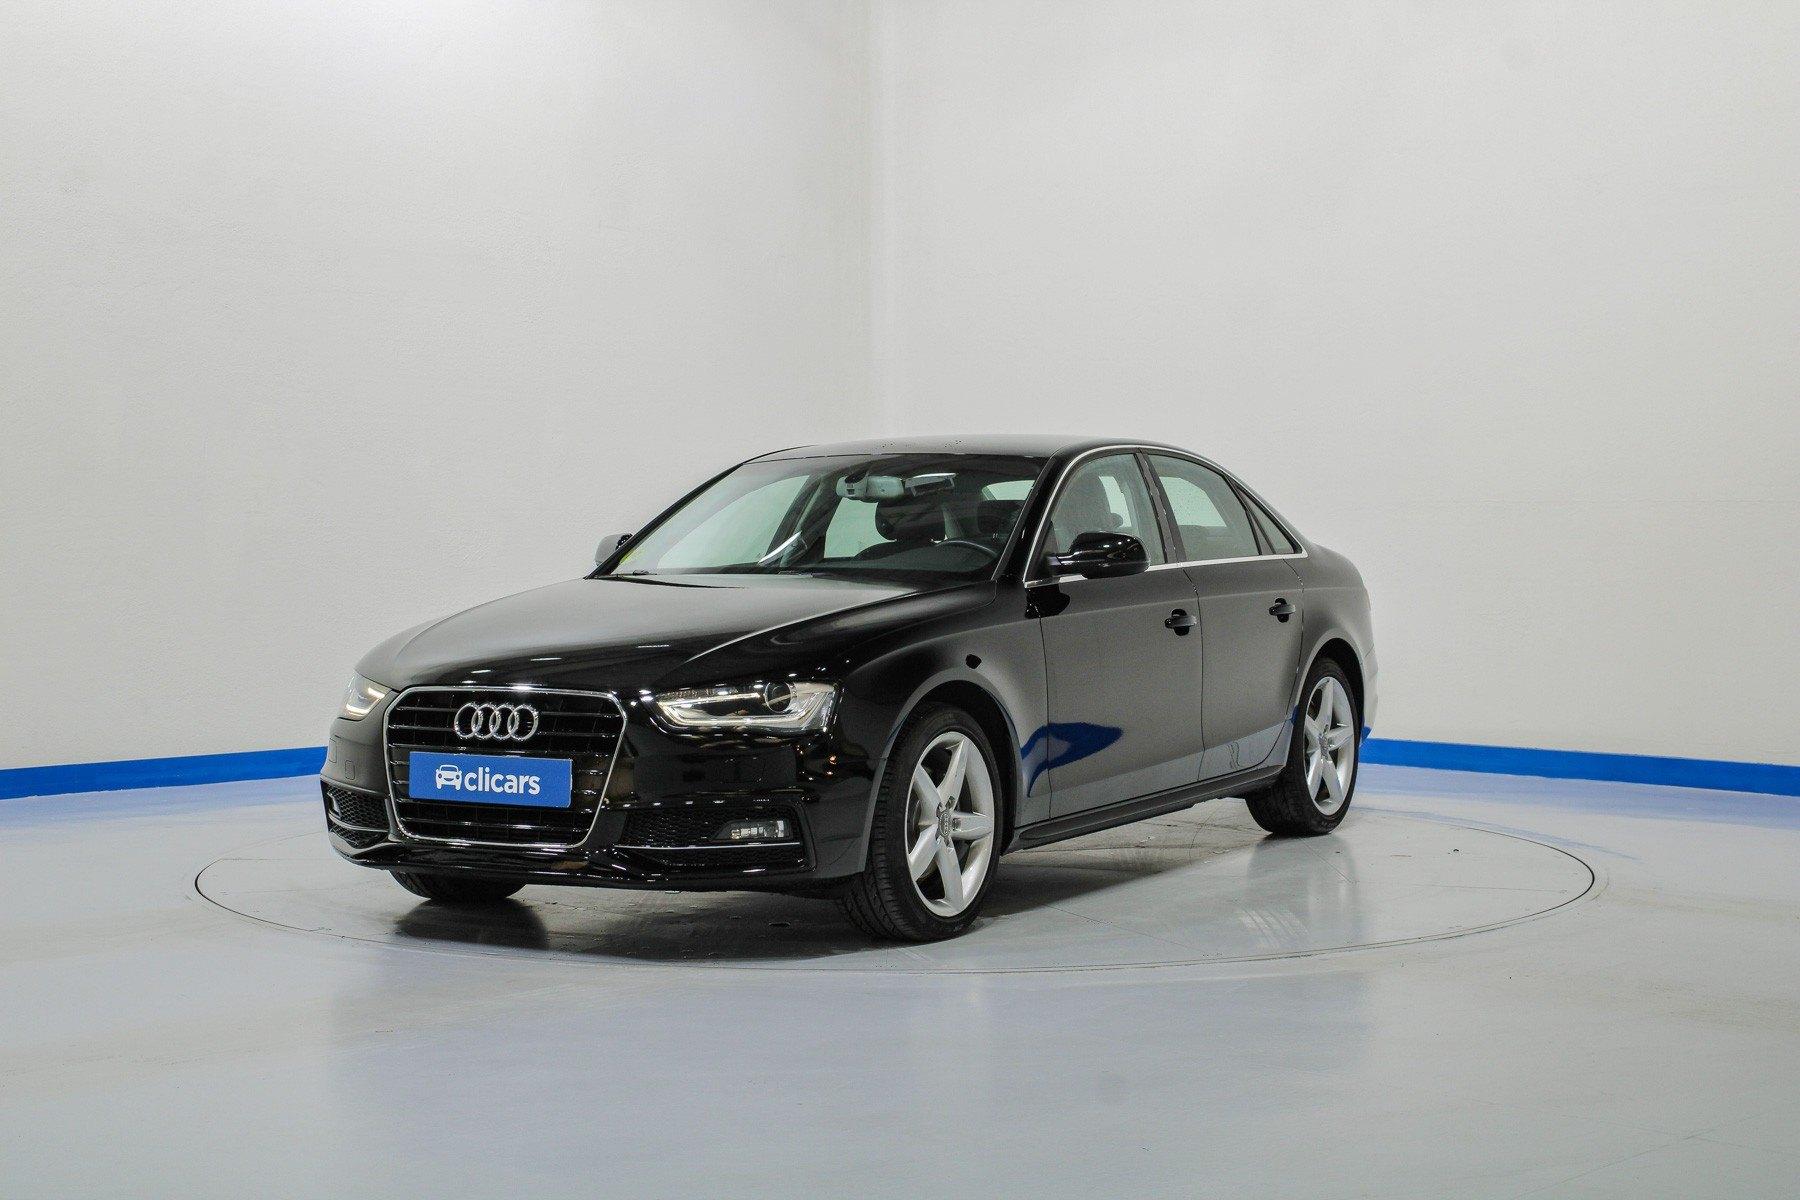 Audi A4 Diésel 2.0 TDI 150CV S line edition 1